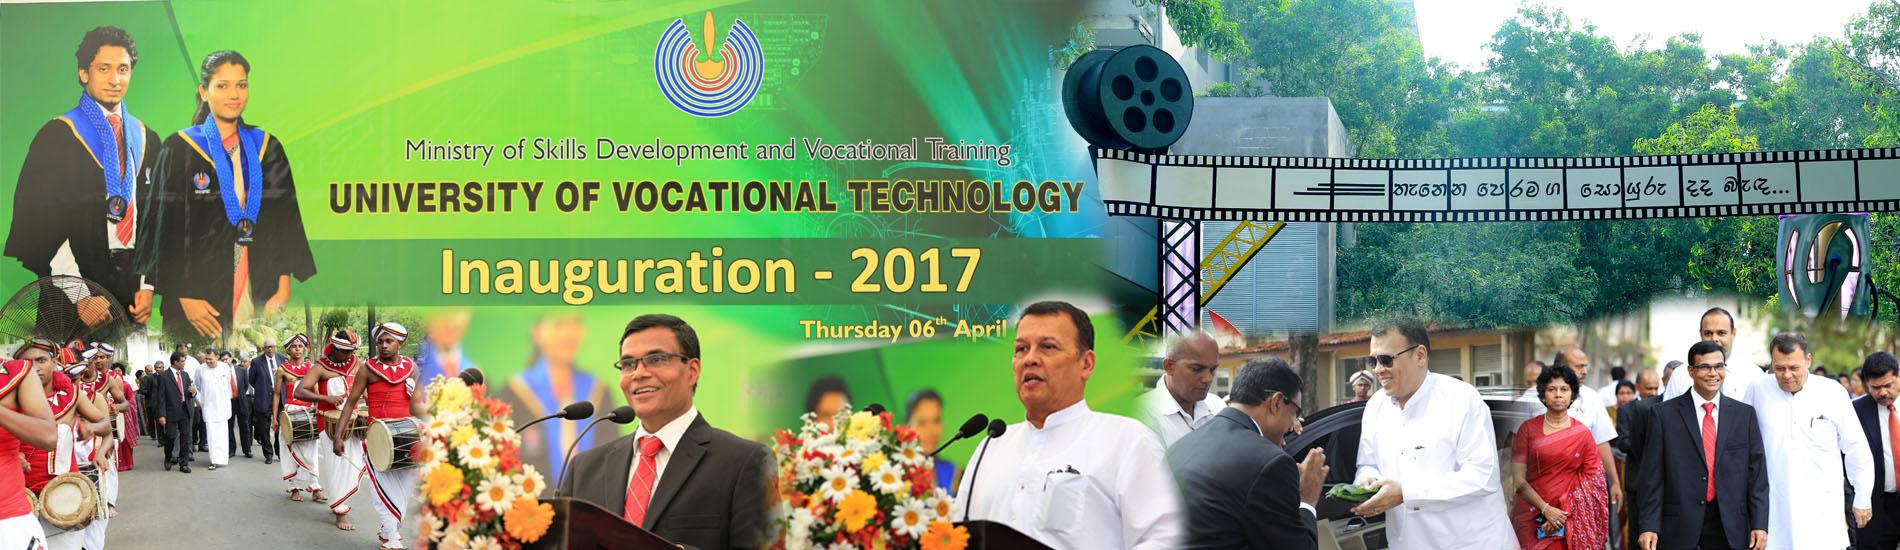 Inauguration 2017